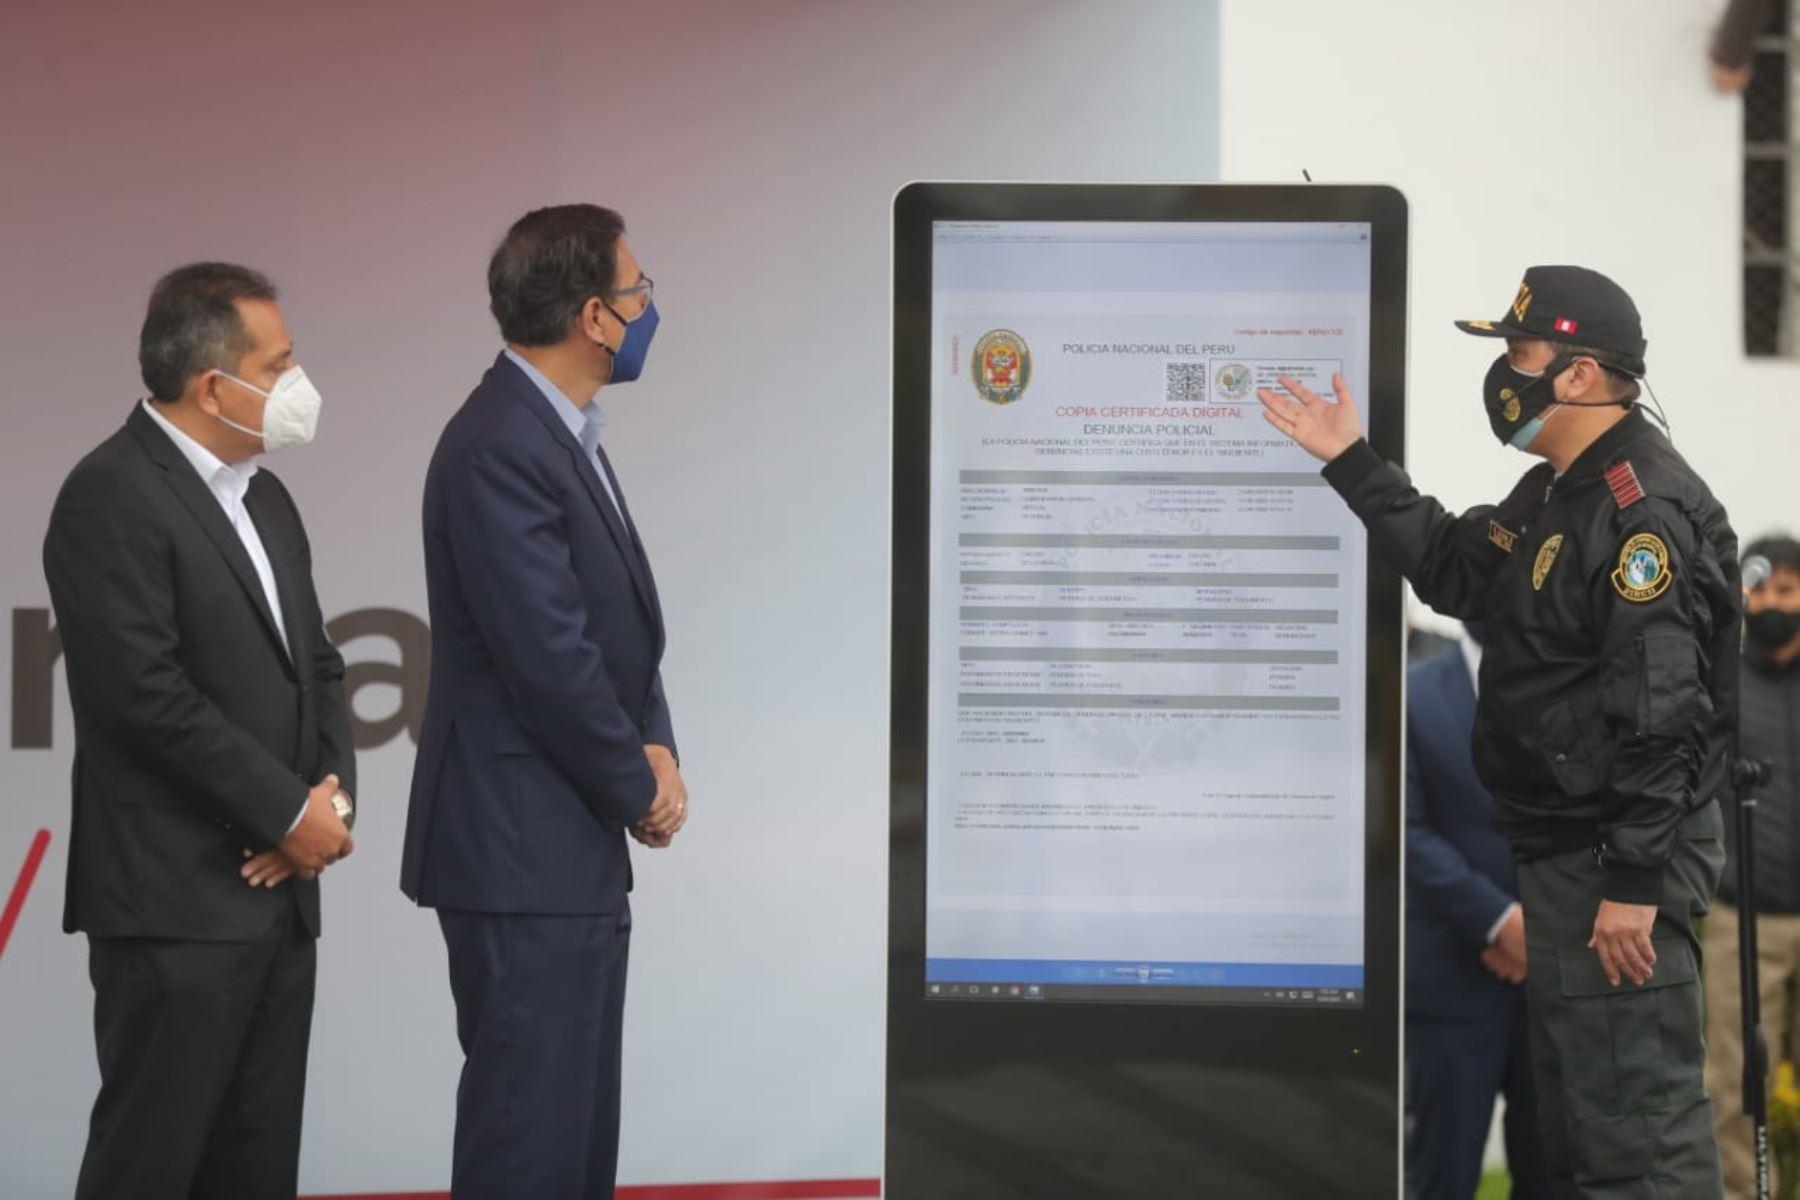 Foto: ANDINA/Prensa Presidencia